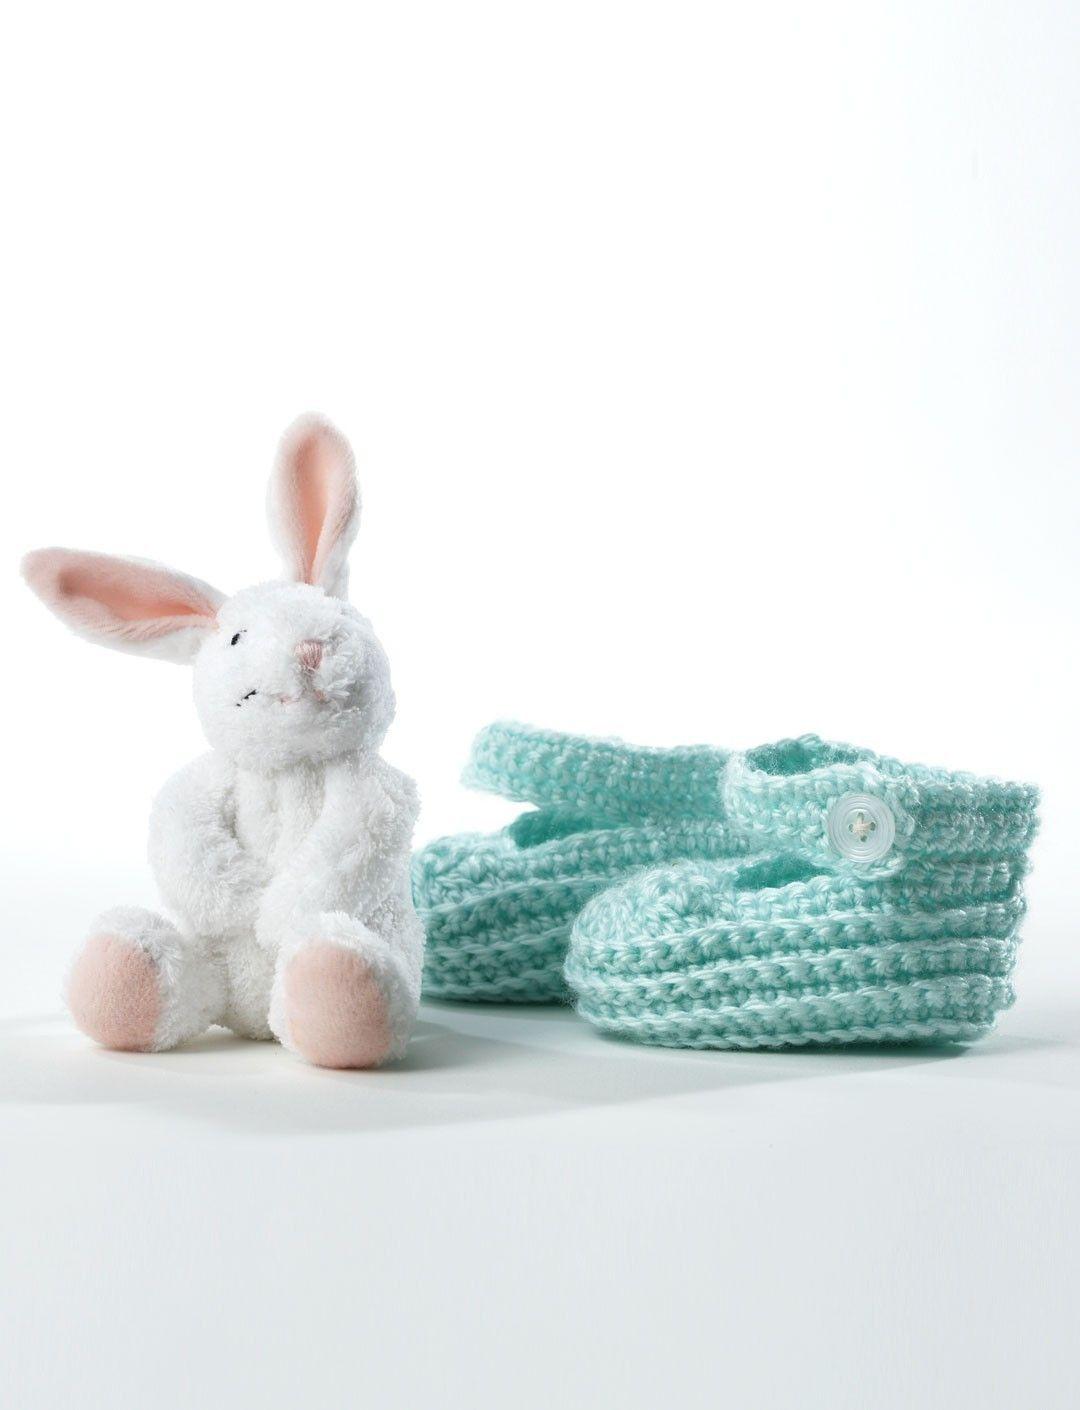 Crochet Booties in Bernat Softee Baby Solids | Crochet Patterns ...